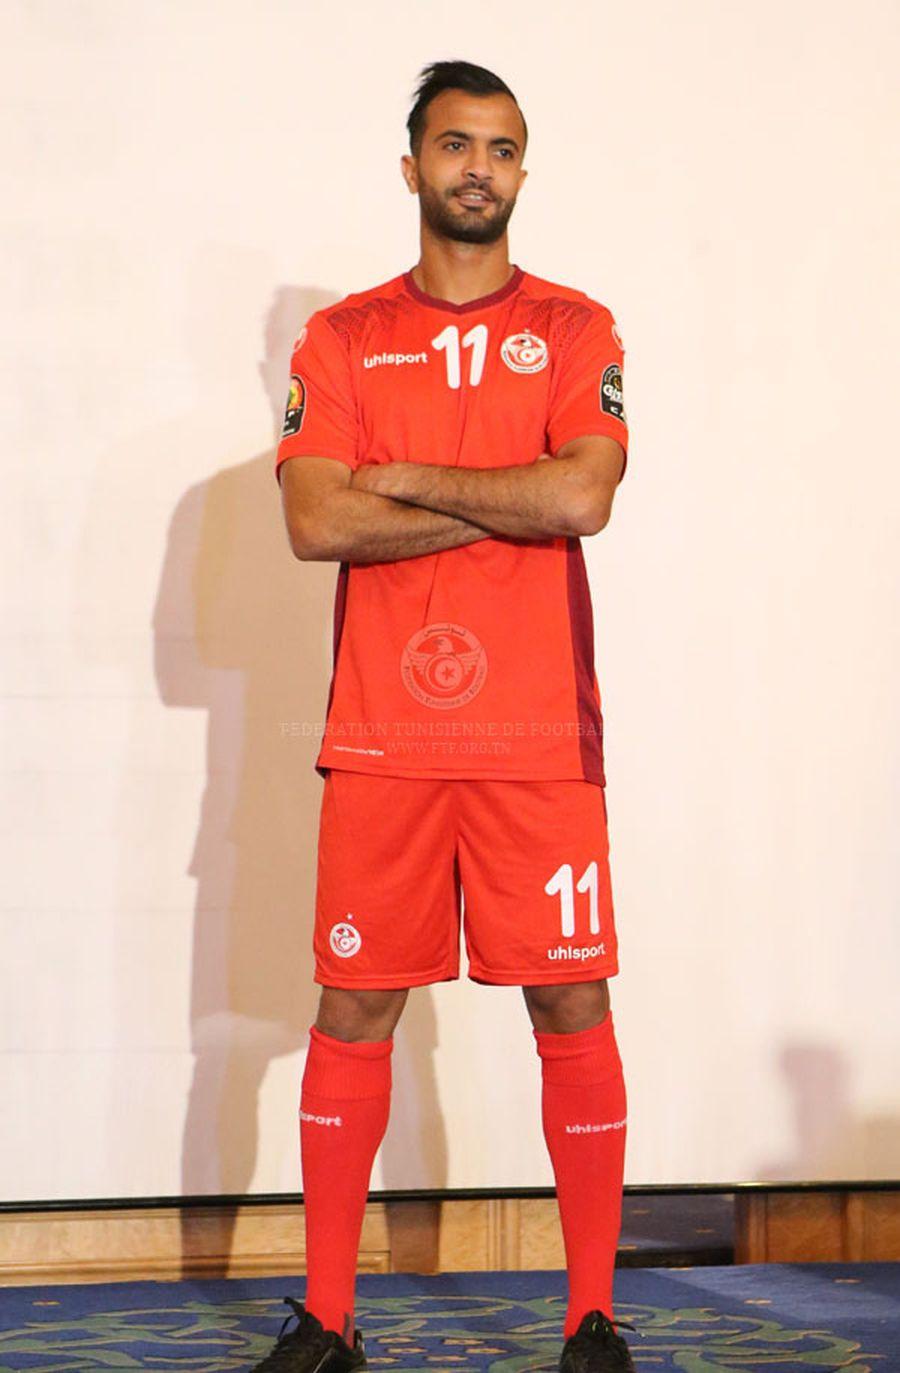 Maillot extérieur Uhlsport Tunisie CAN 2017